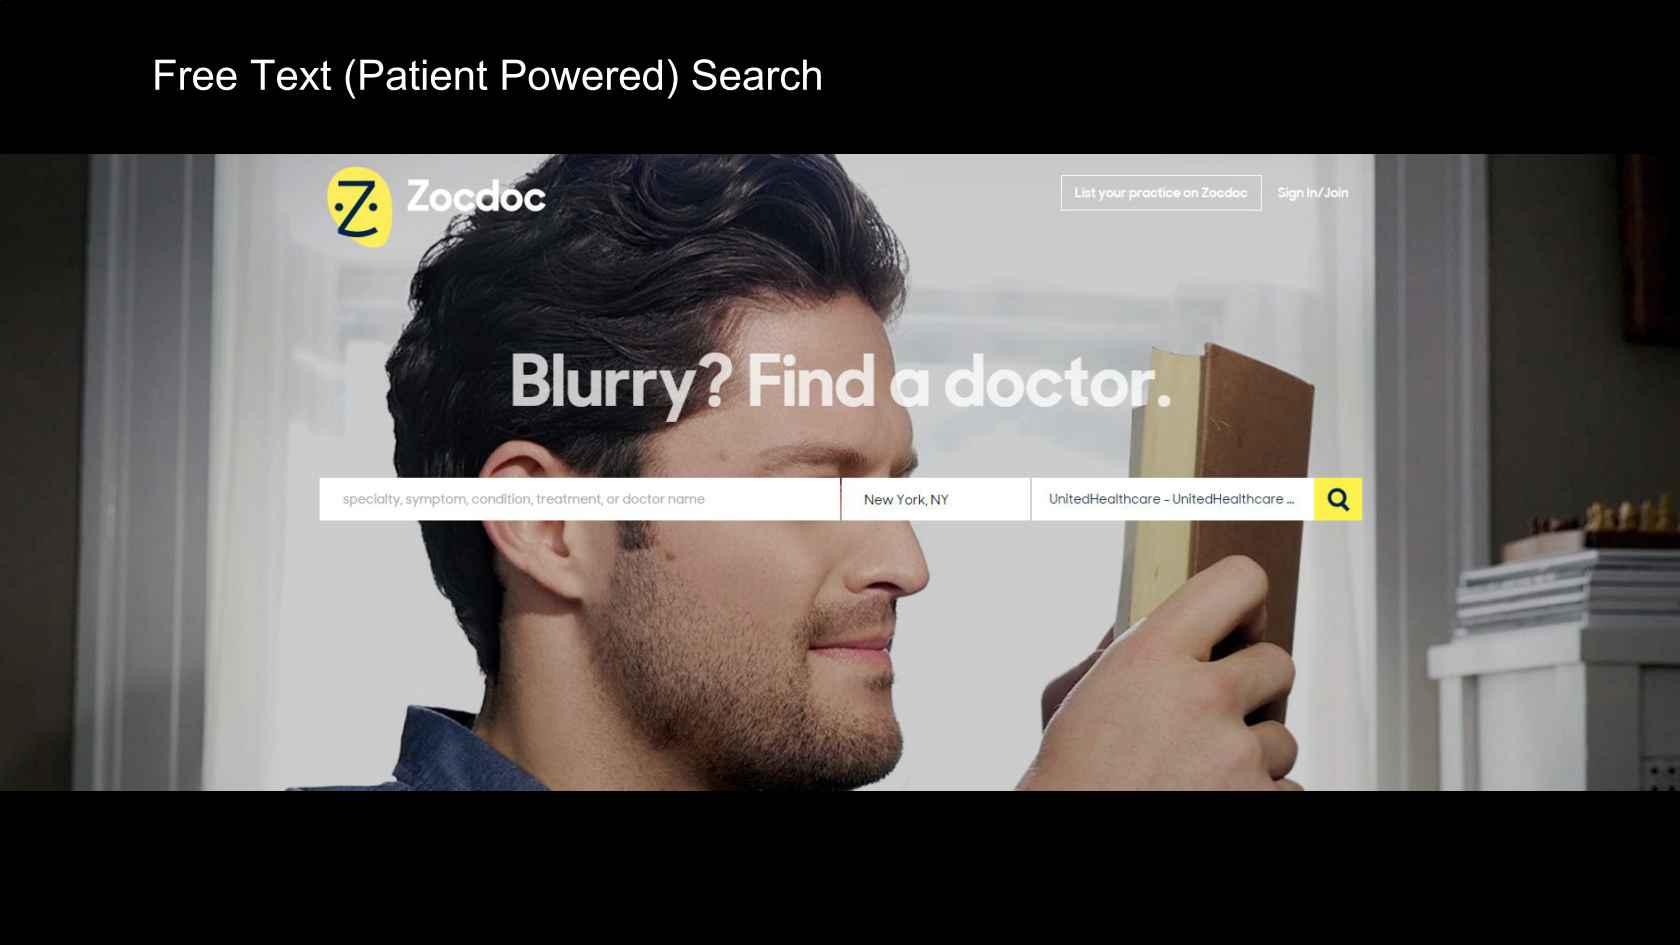 Architecture & Algorithms Powering Search @ZocDoc